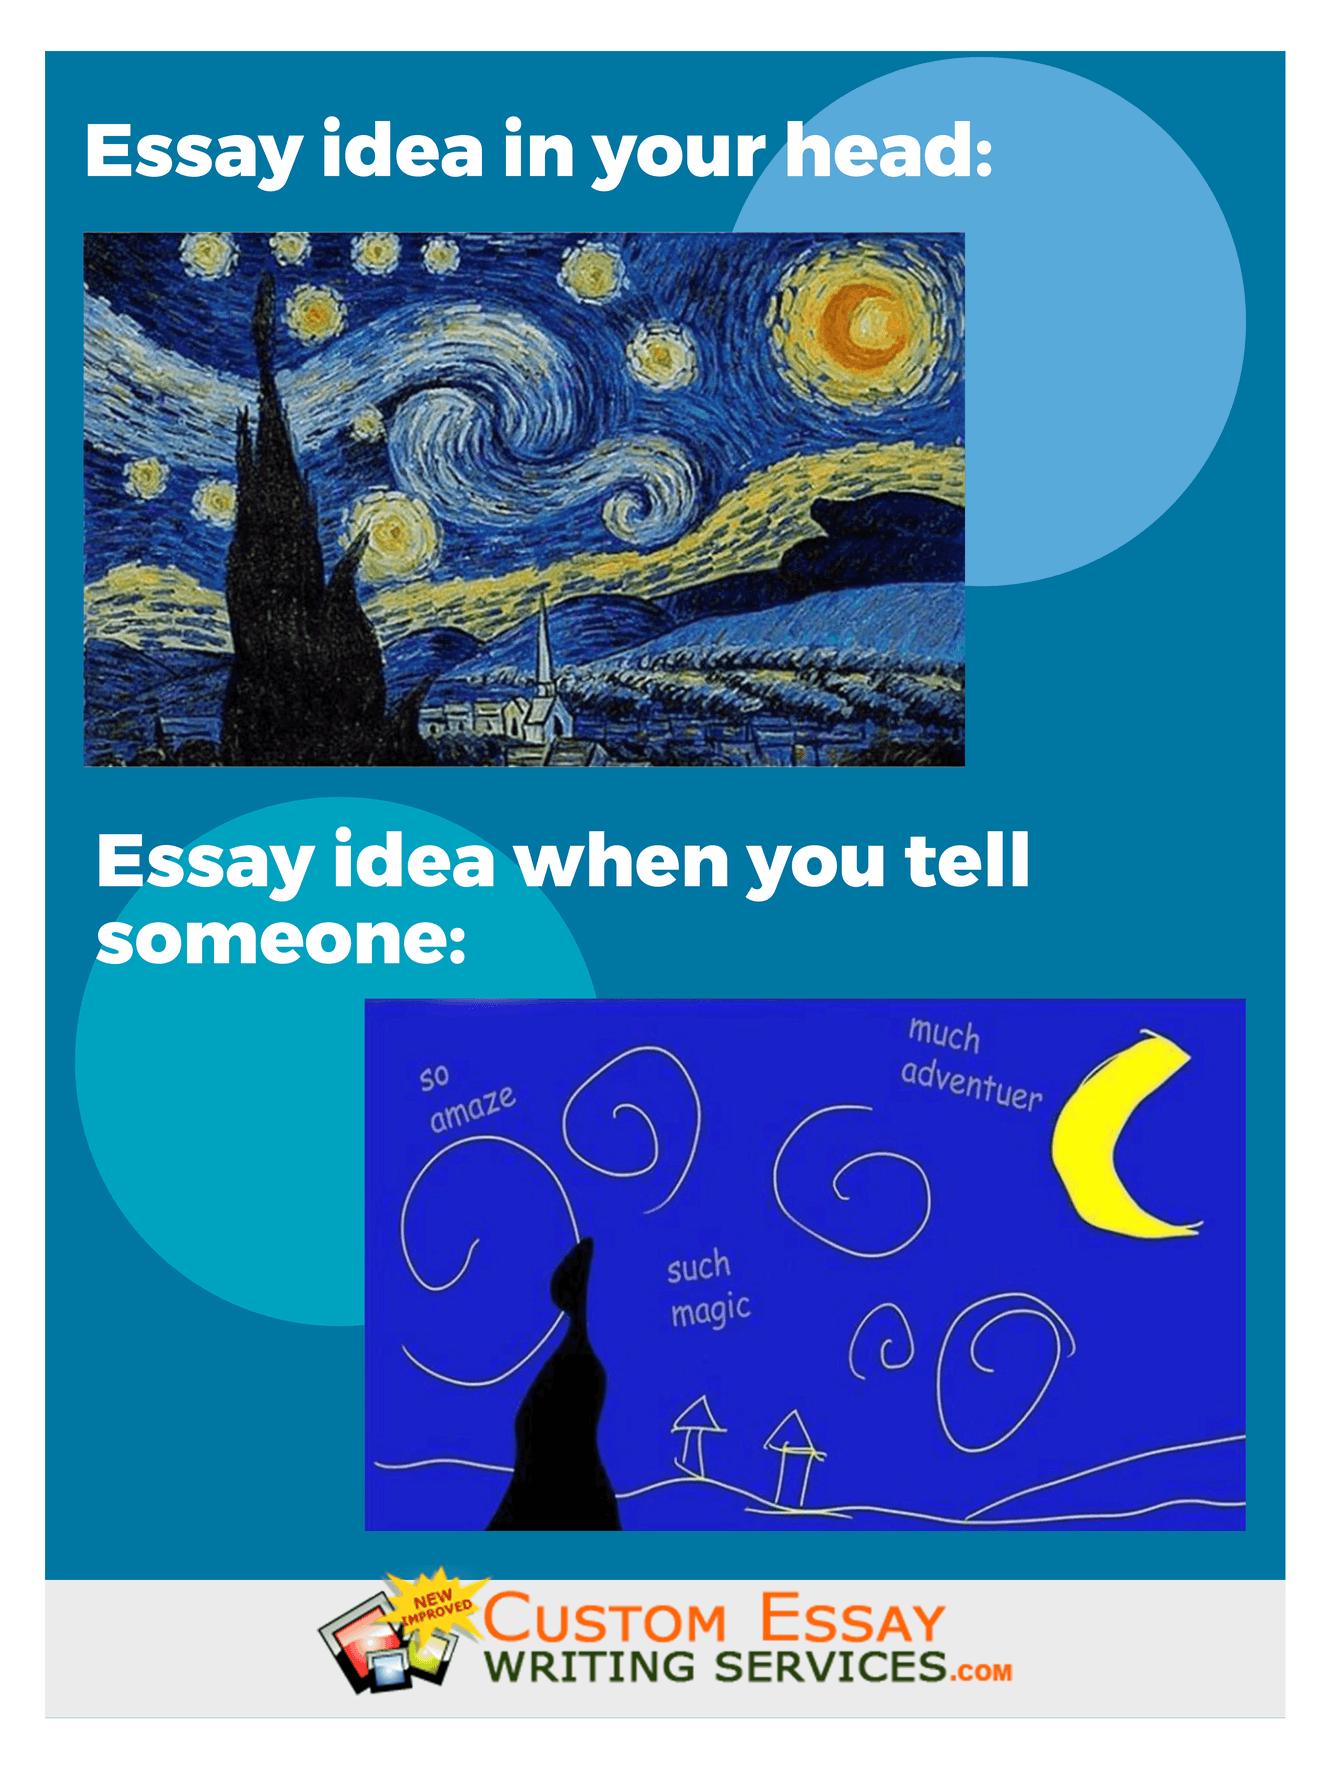 custom essay toronto